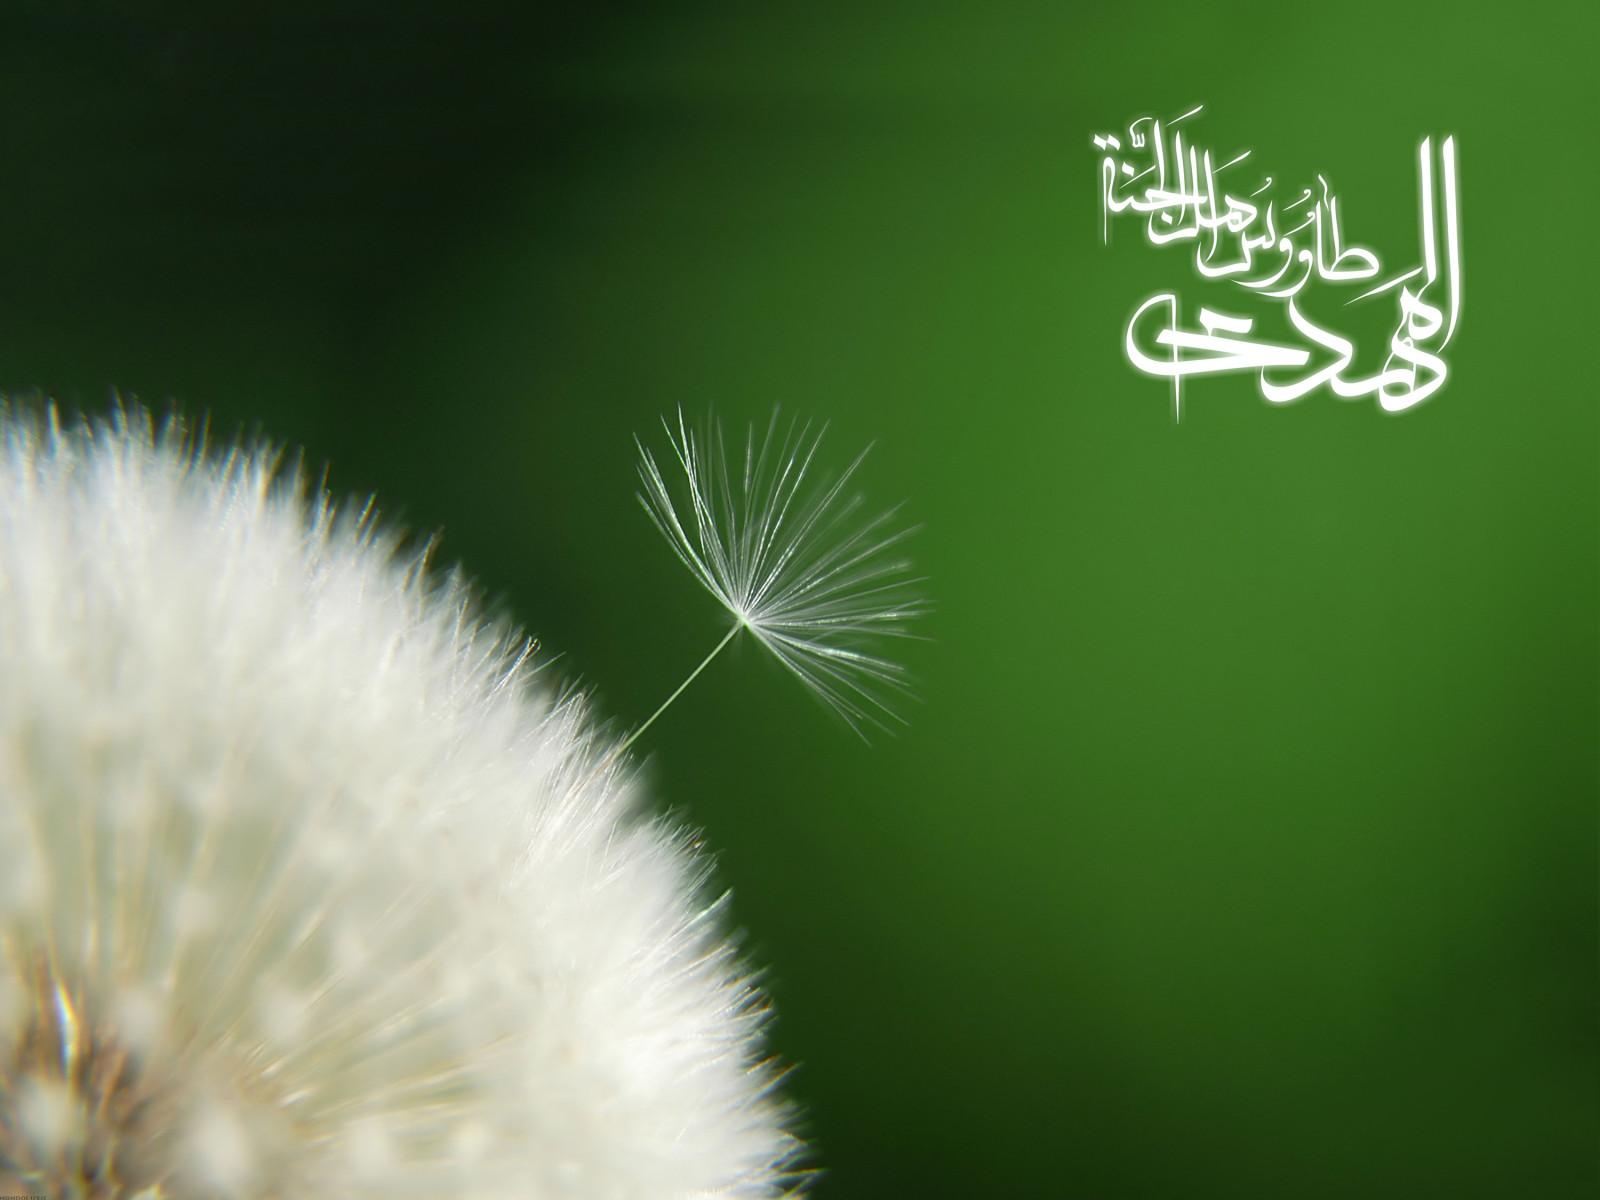 http://dl.aviny.com/Album/mazhabi/ahlbeit/mahdi/kamel/206.jpg